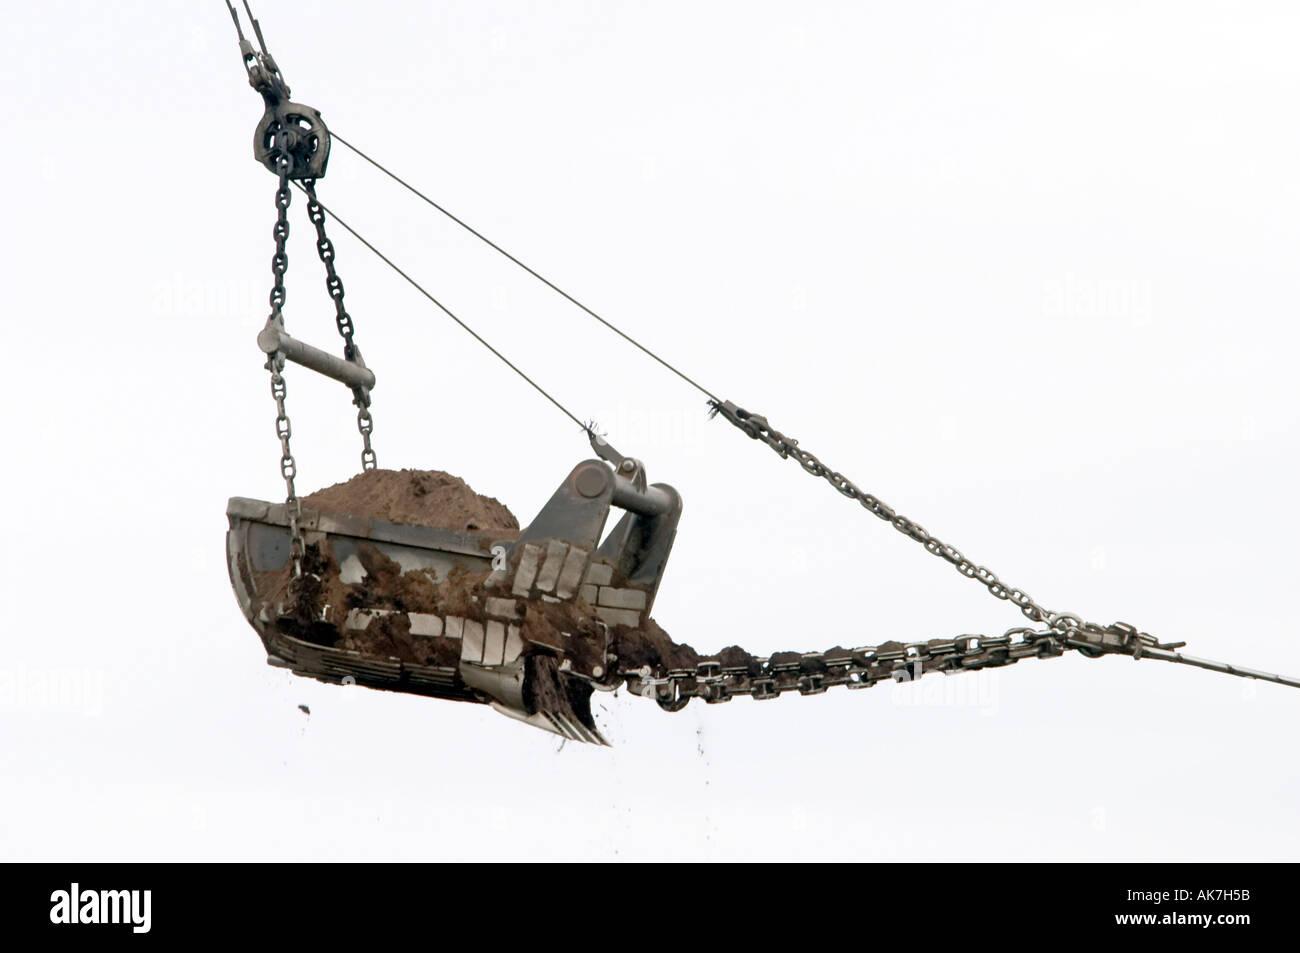 bucket of a brown coal digger - Stock Image